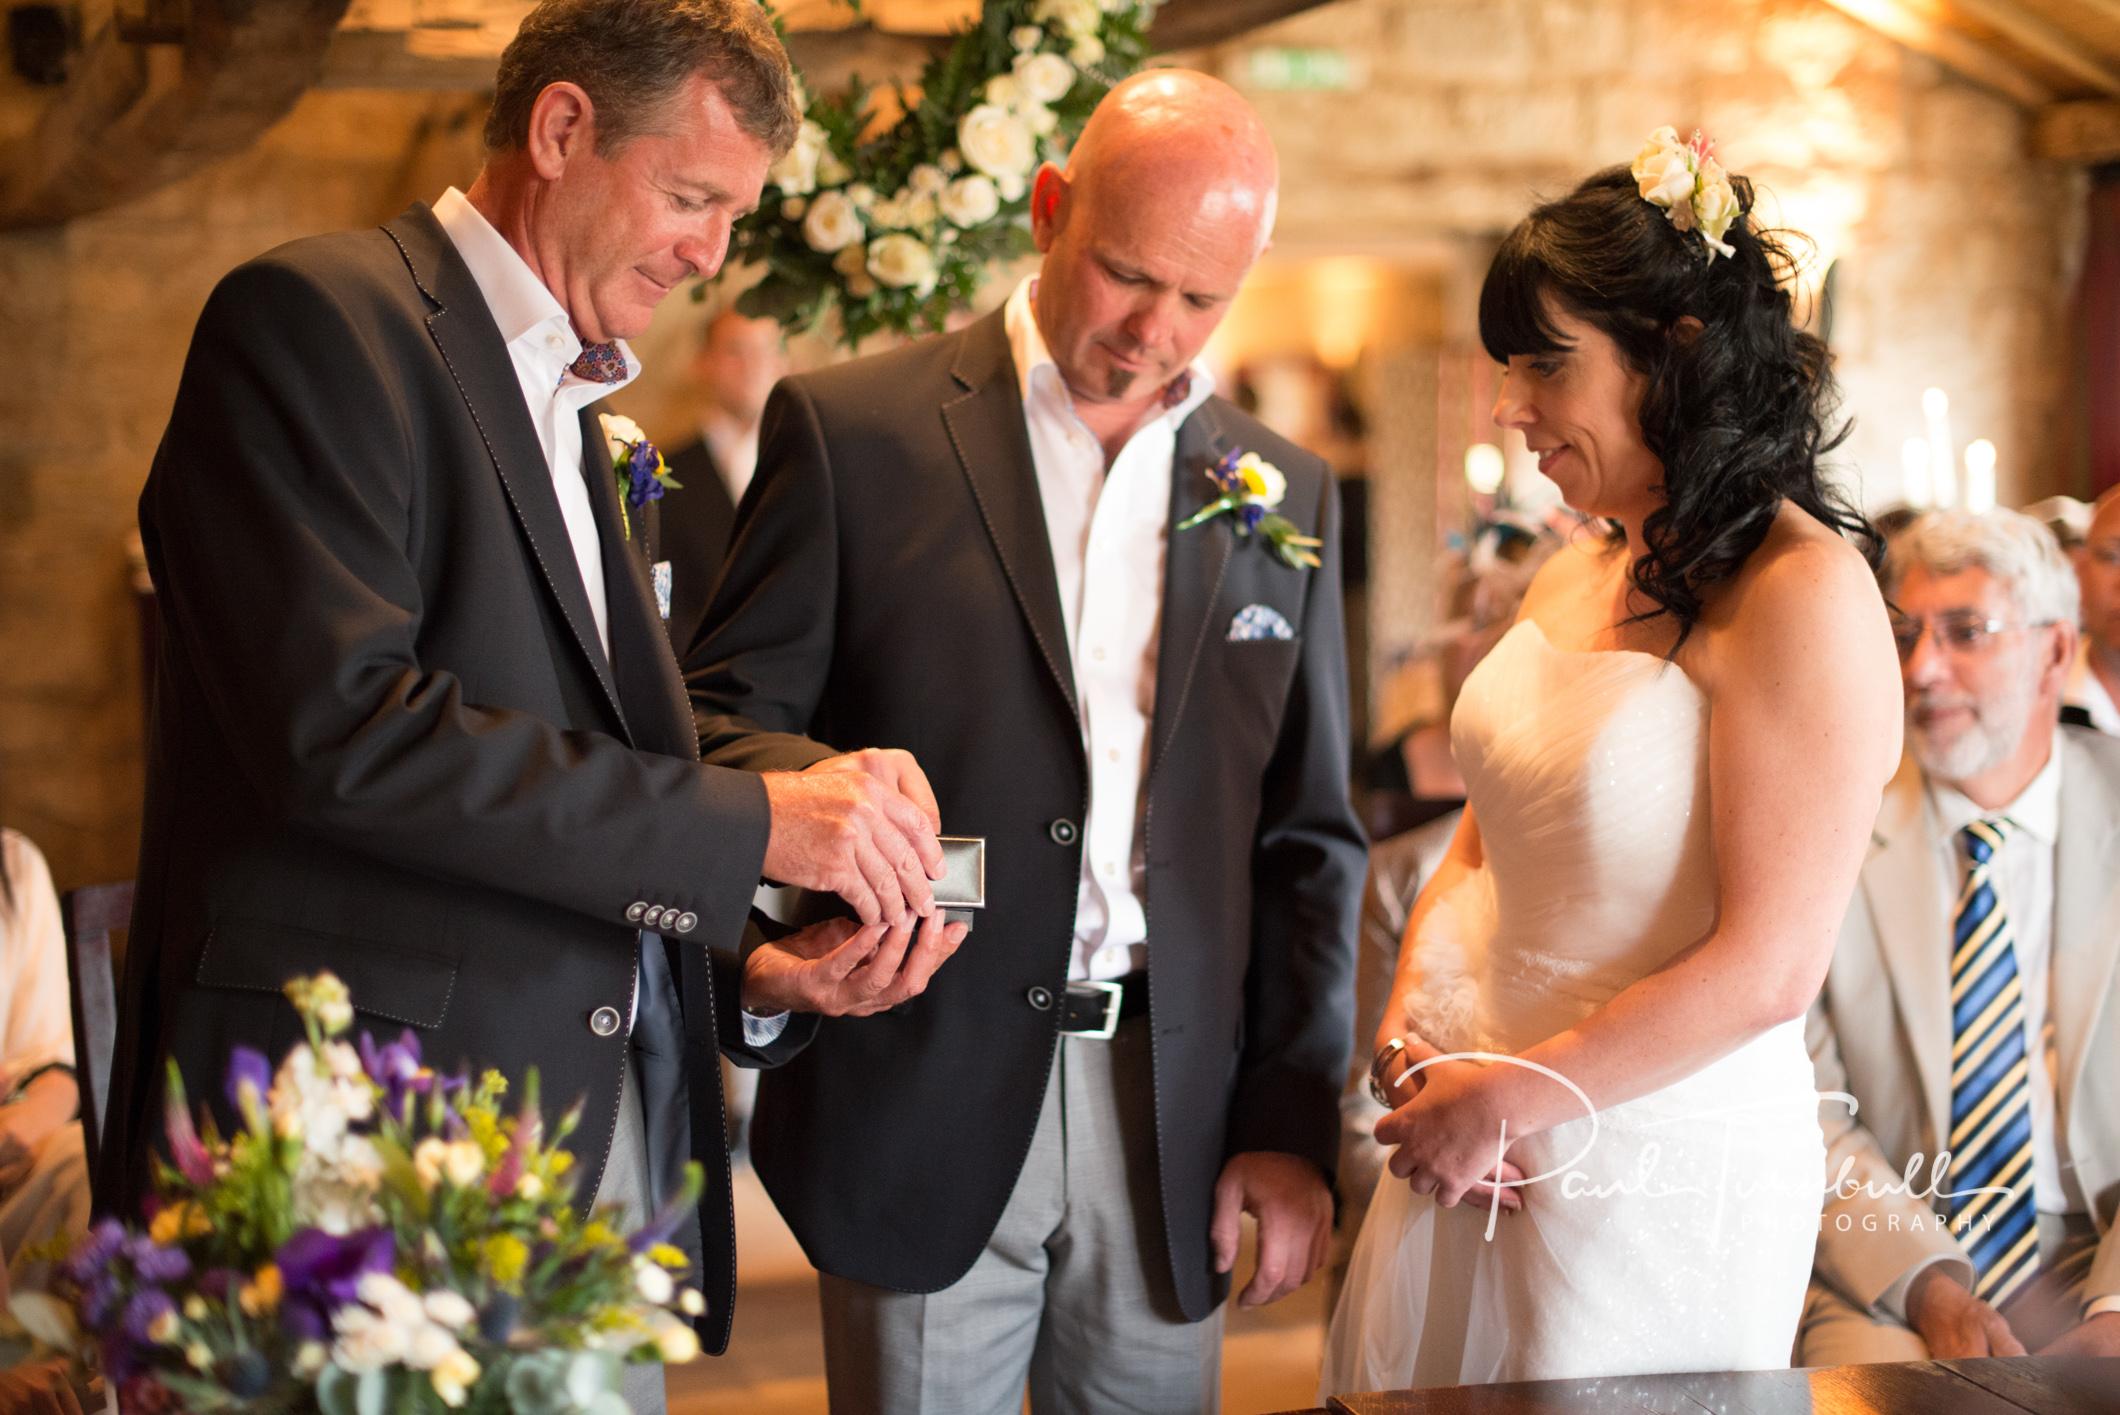 wedding-photography-star-inn-harome-yorkshire-014.jpg